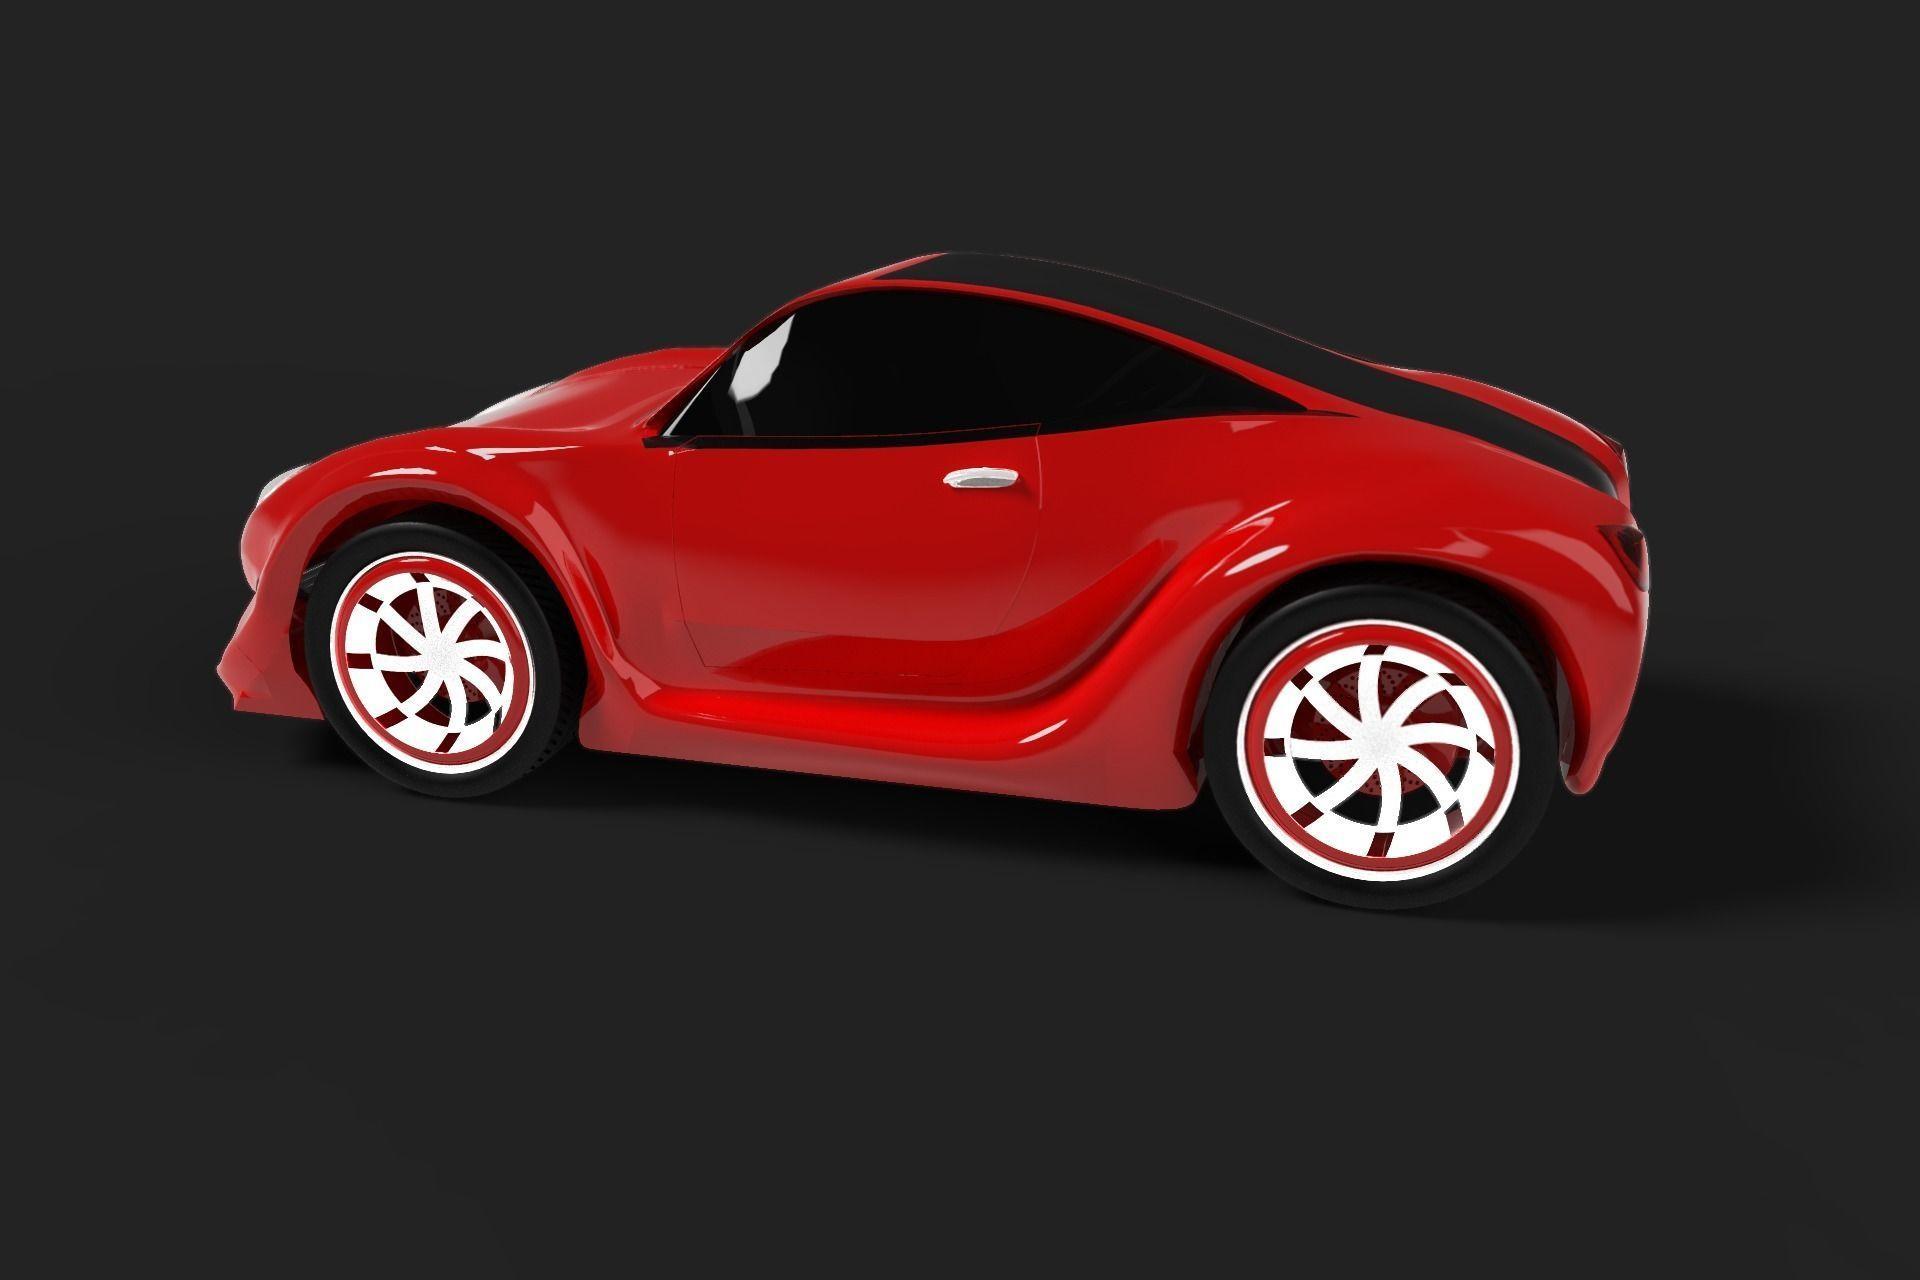 The Concept Sportscar